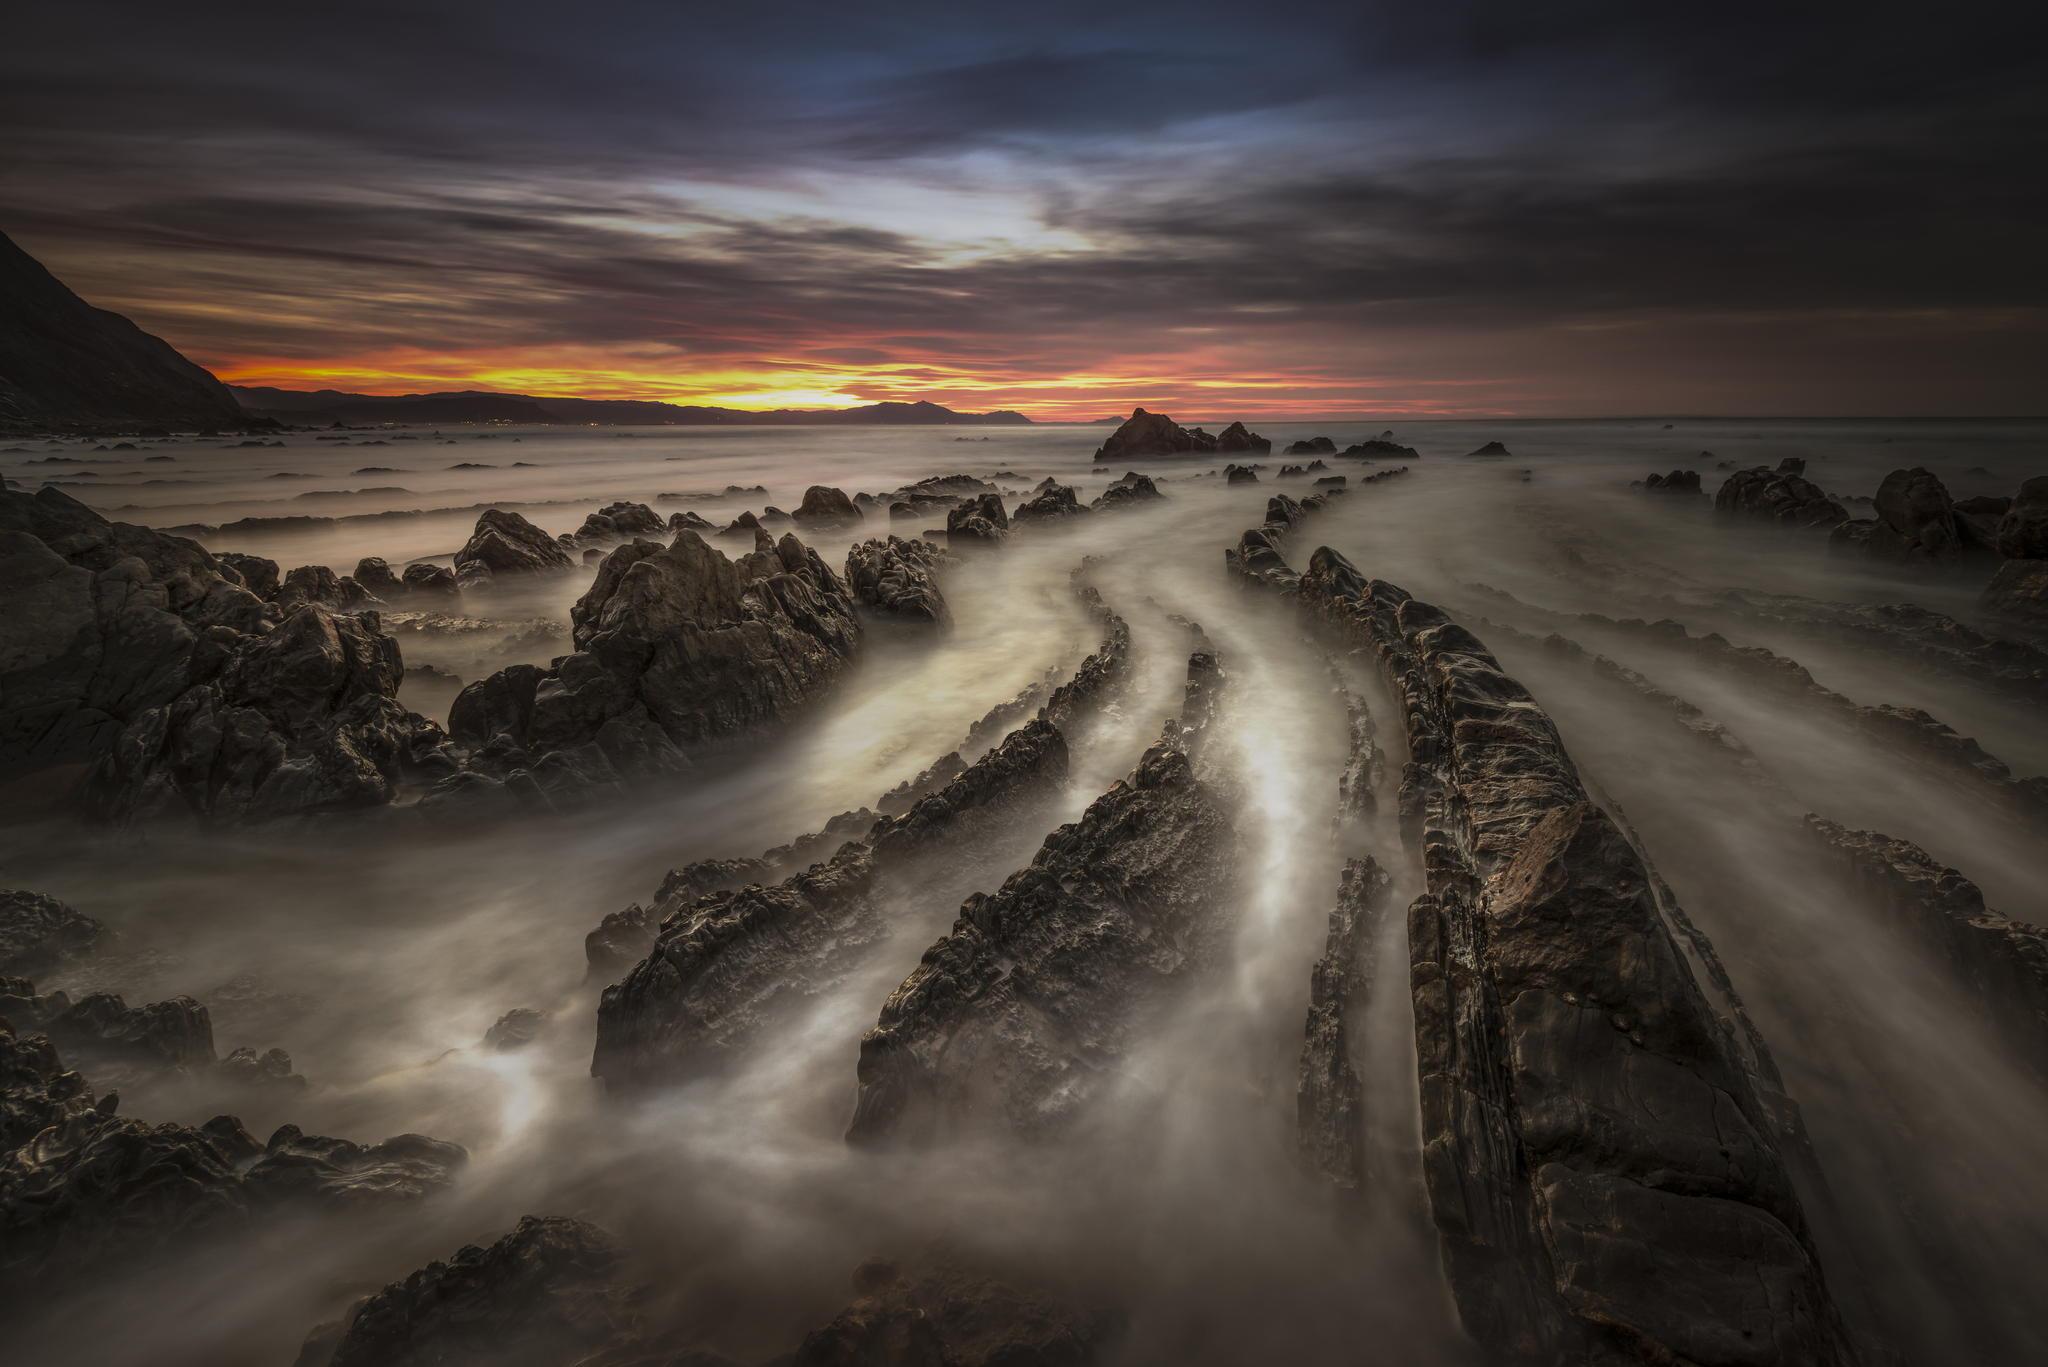 Sunset at Barrika beach.jpg